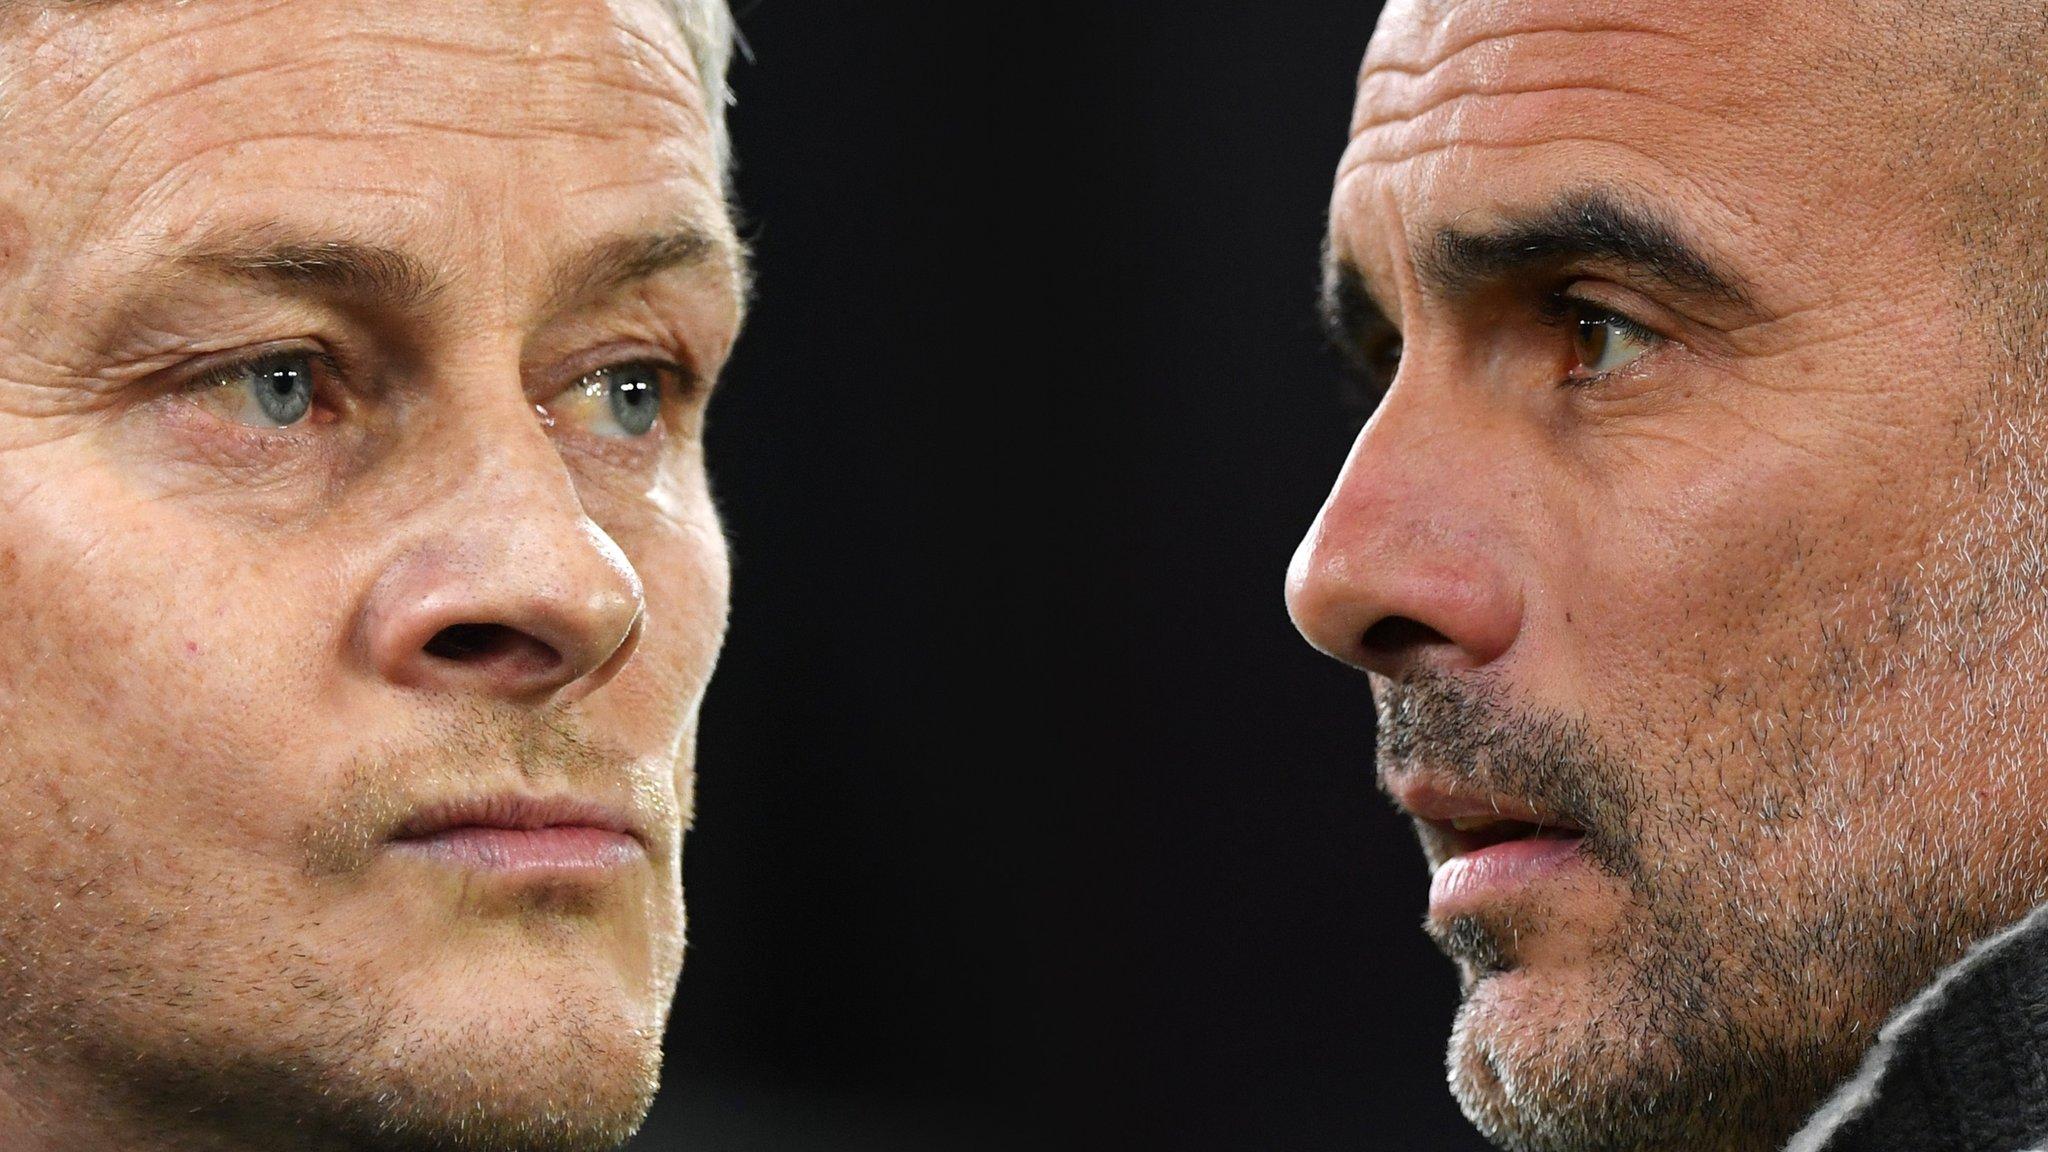 Man Utd v Man City: Pep Guardiola surprised by Ole Gunnar Solskjaer comments